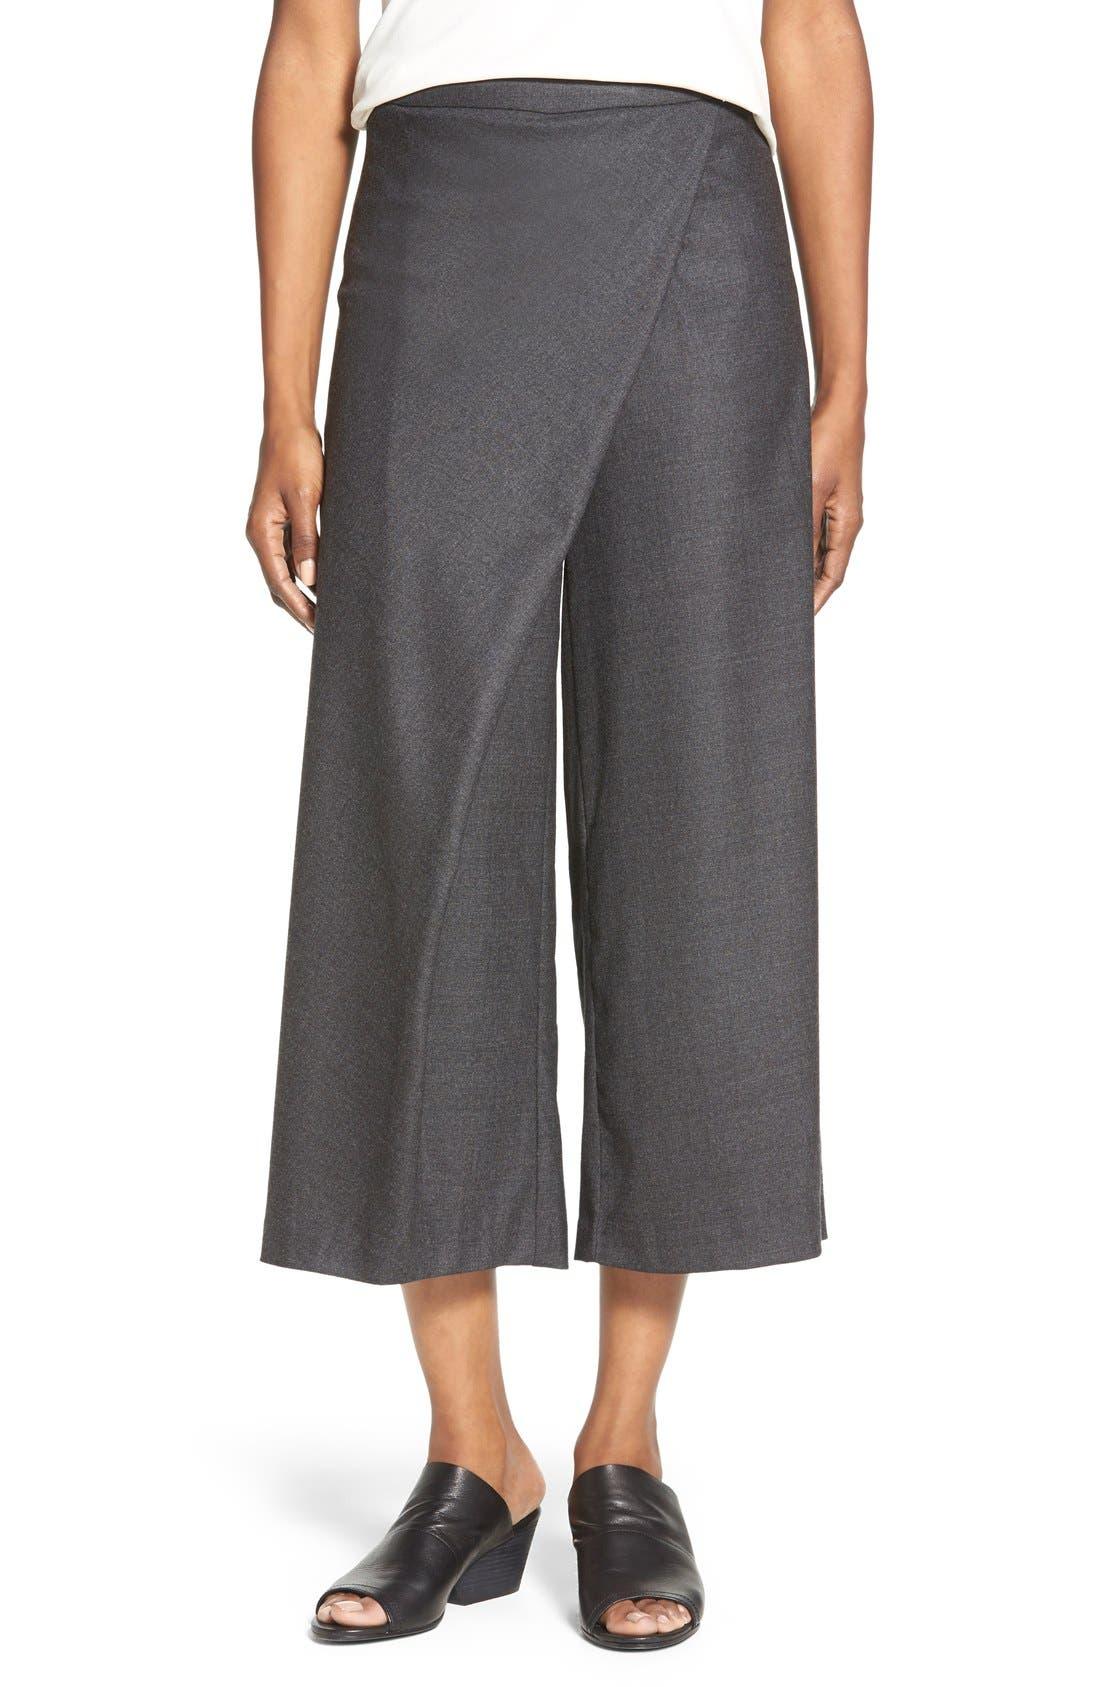 Alternate Image 1 Selected - Eileen Fisher Wool Twill Sarong Pants  (Regular & Petite)